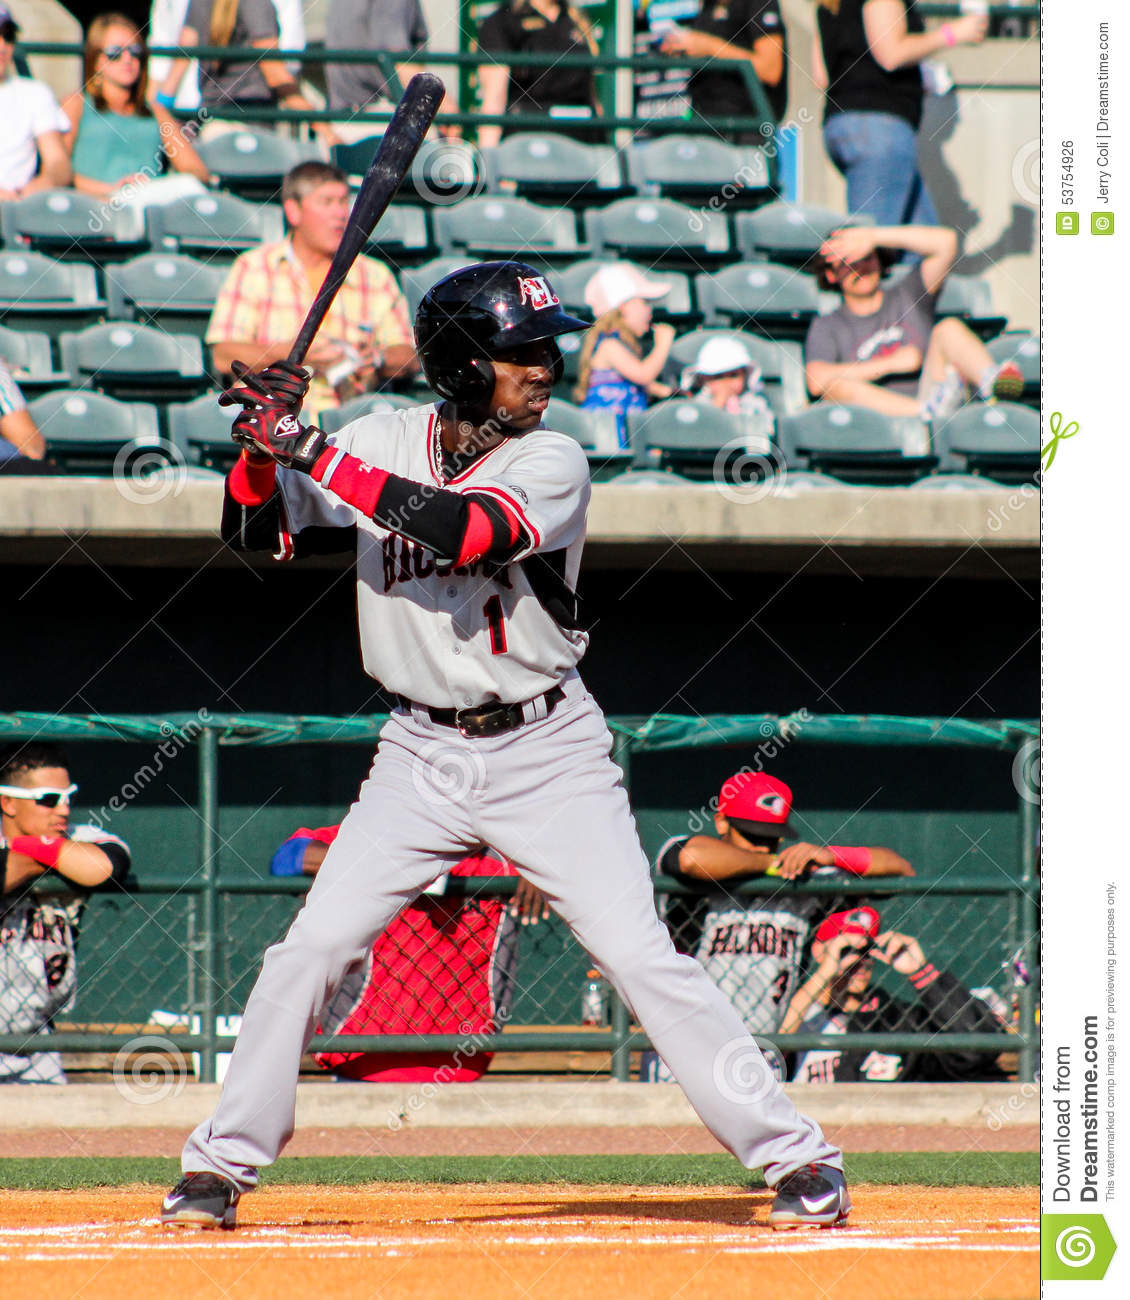 michael-de-leon-hickory-crawdads-shortstop-53754926